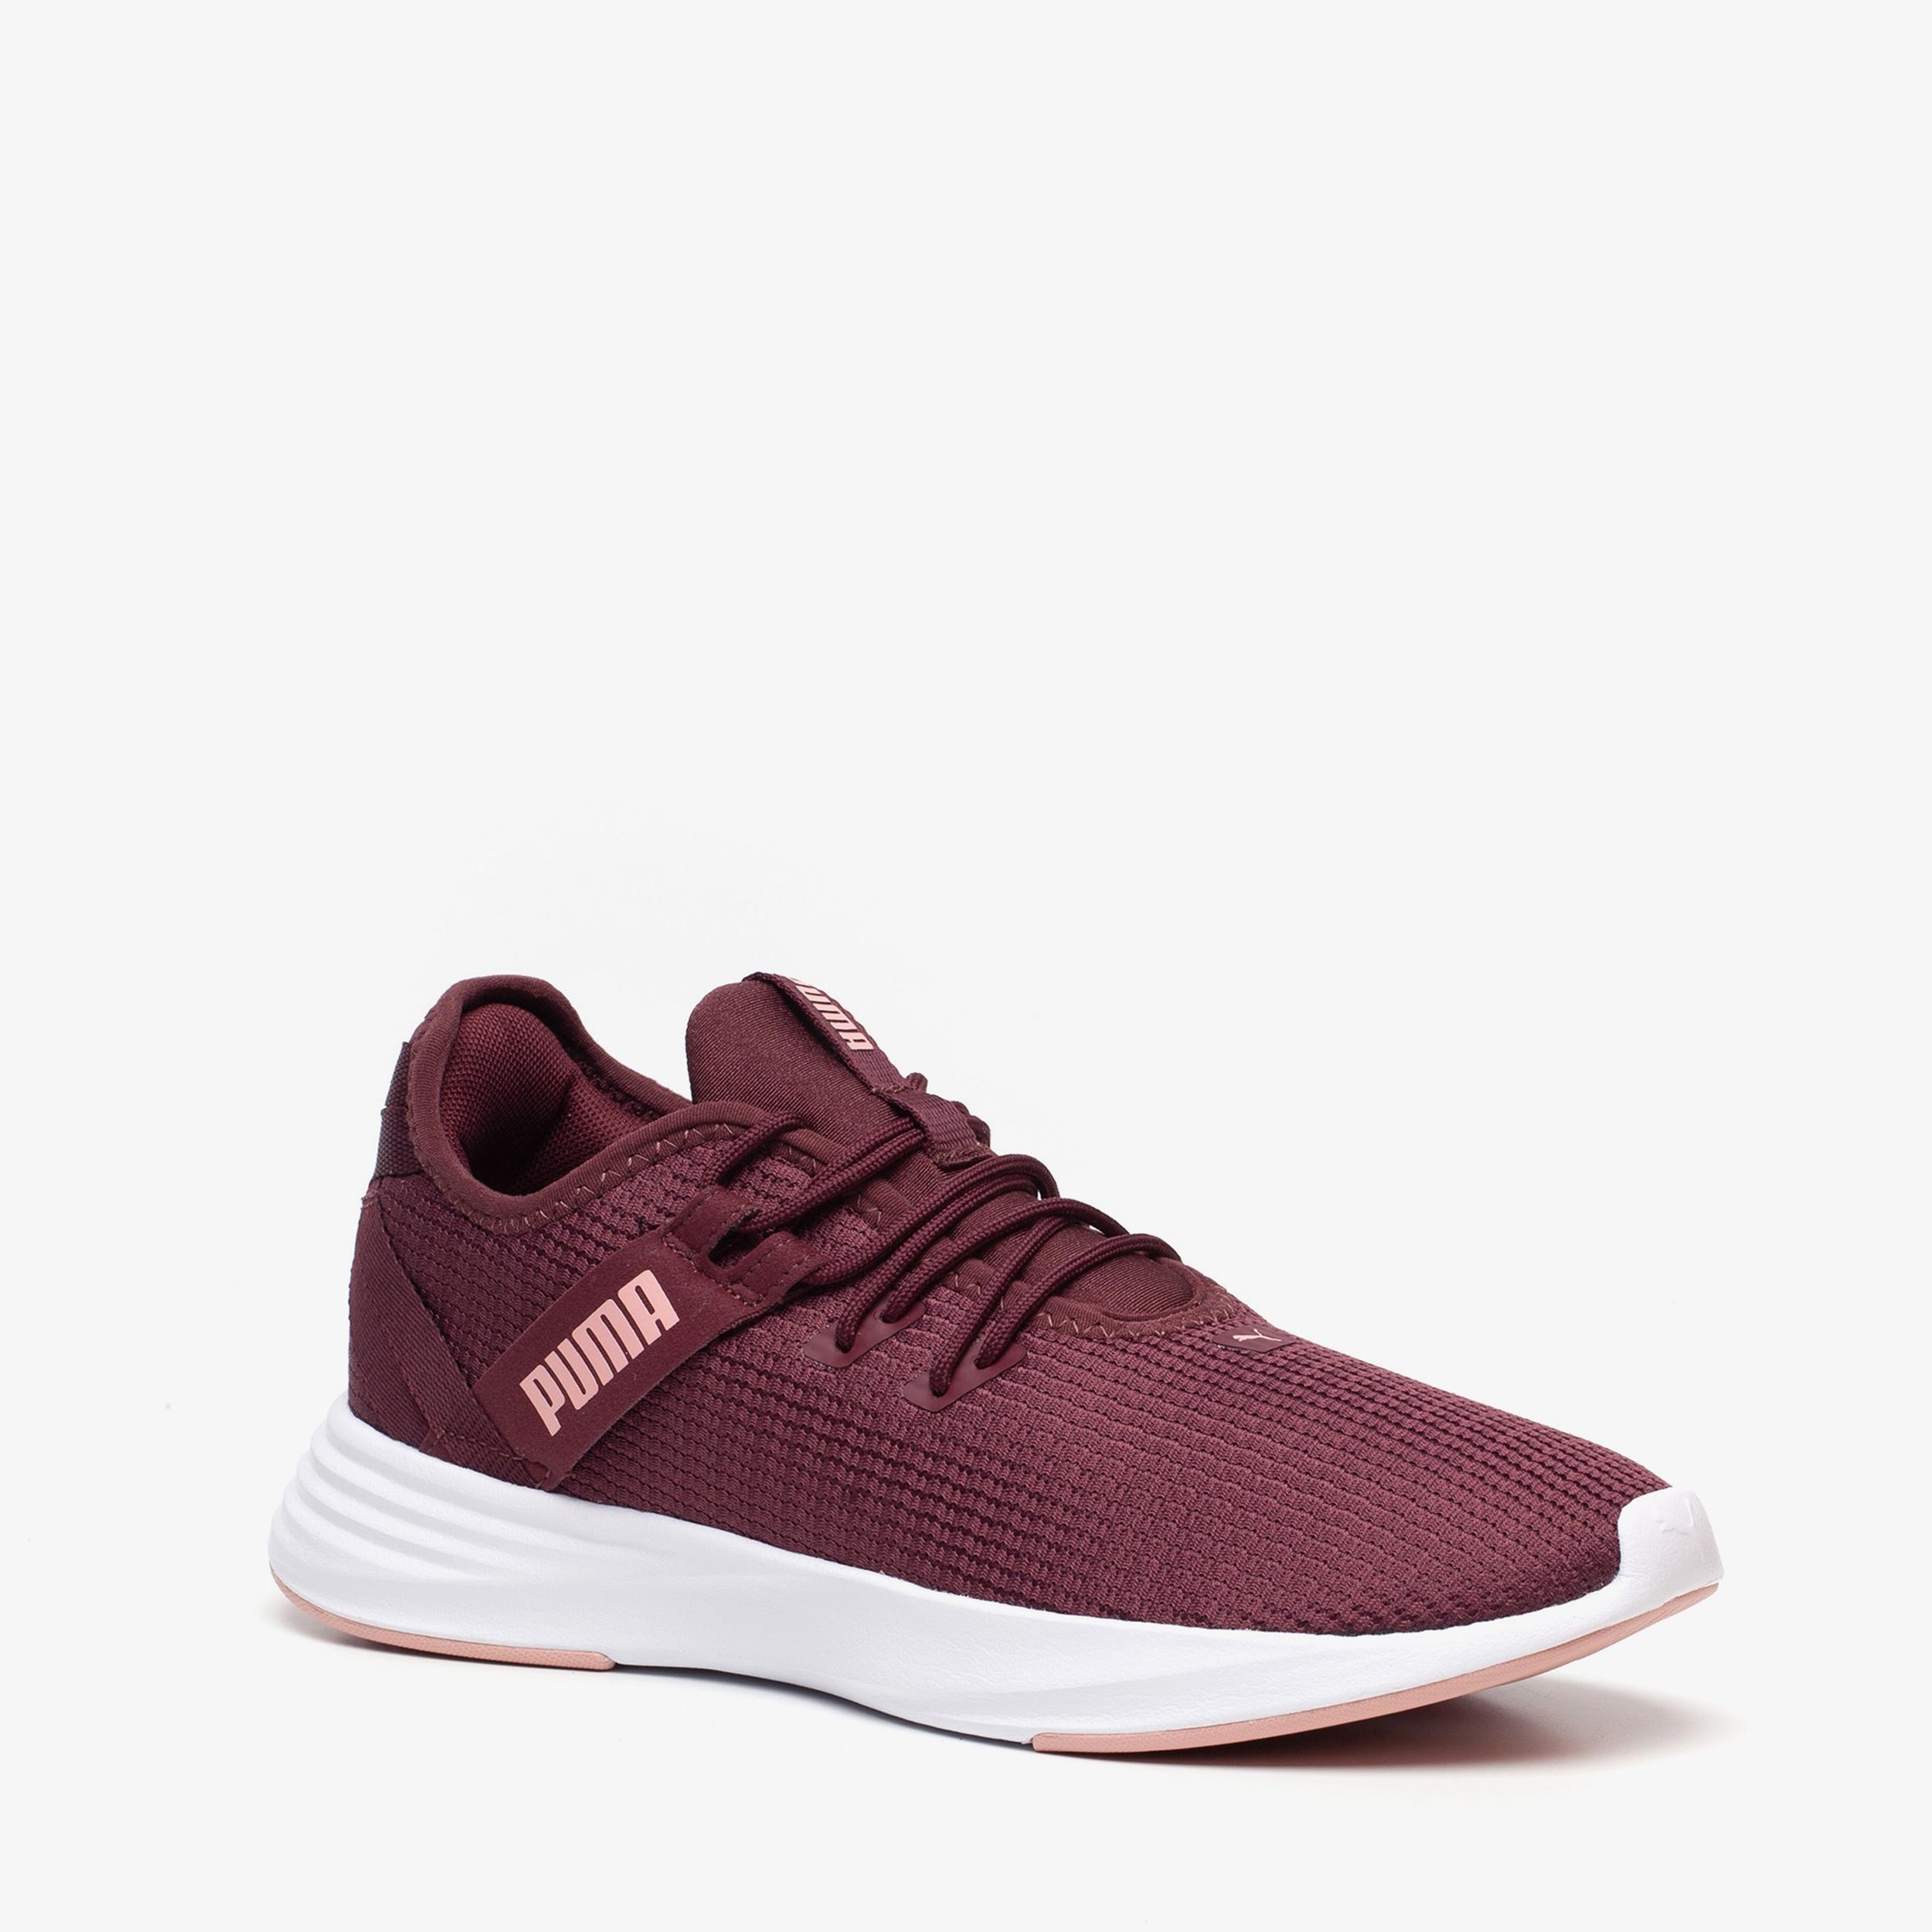 Puma Radiate XT dames sneakers